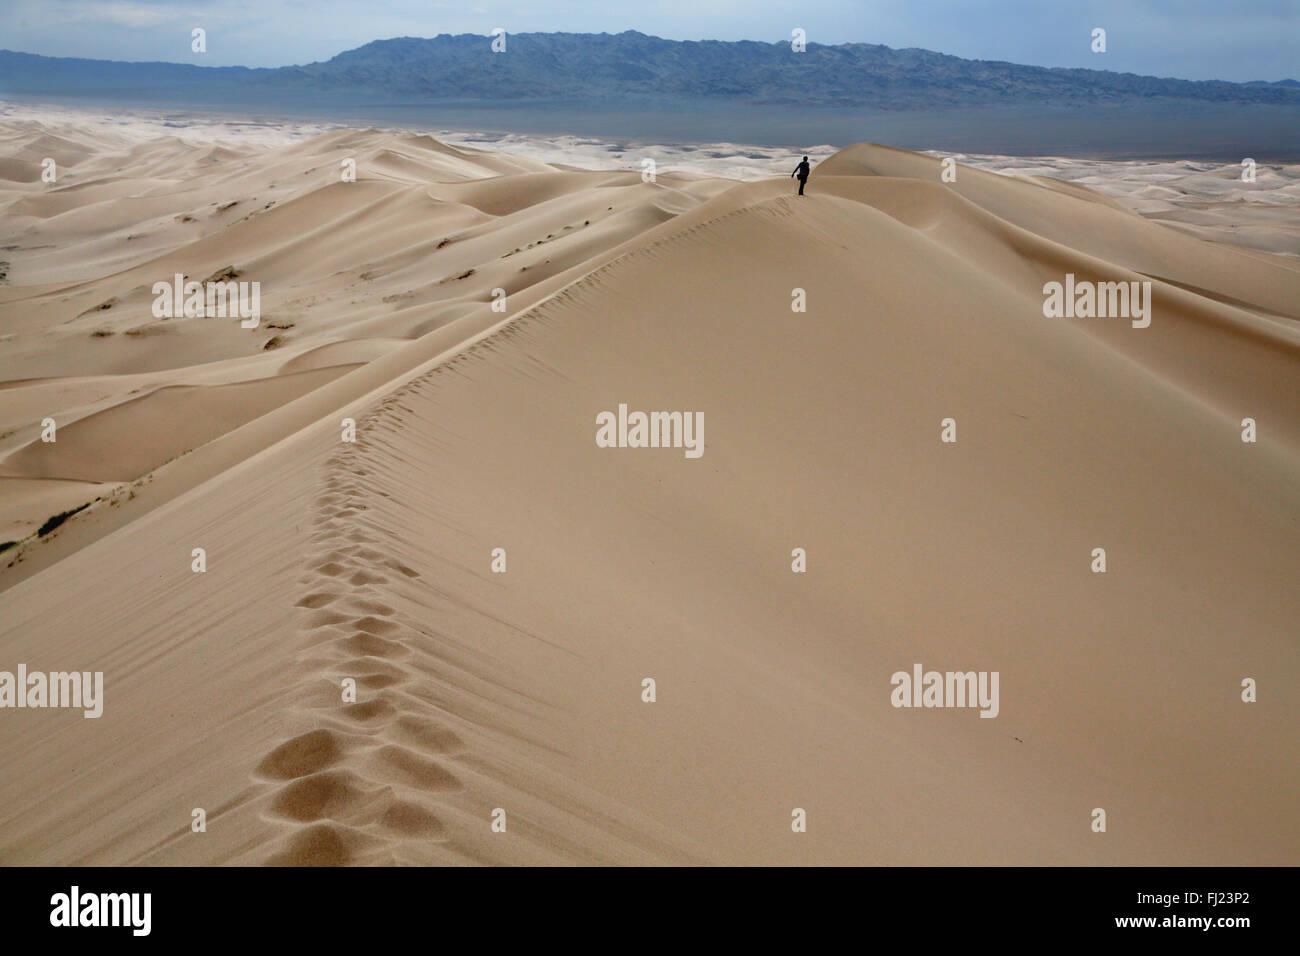 Gobi sand dunes in Mongolia - Stock Image